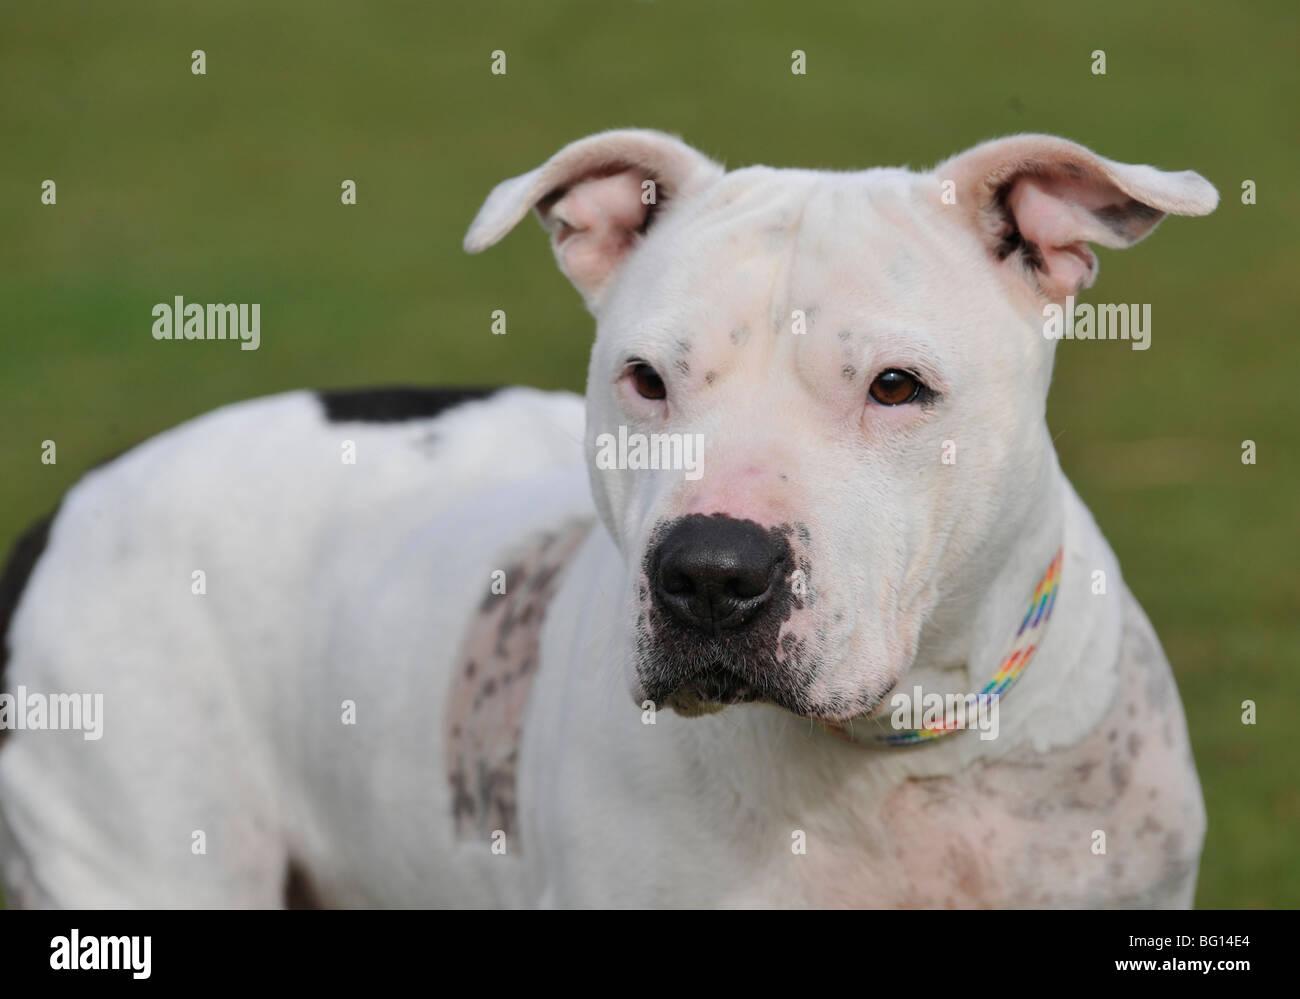 american pitbull terrier type dog - Stock Image